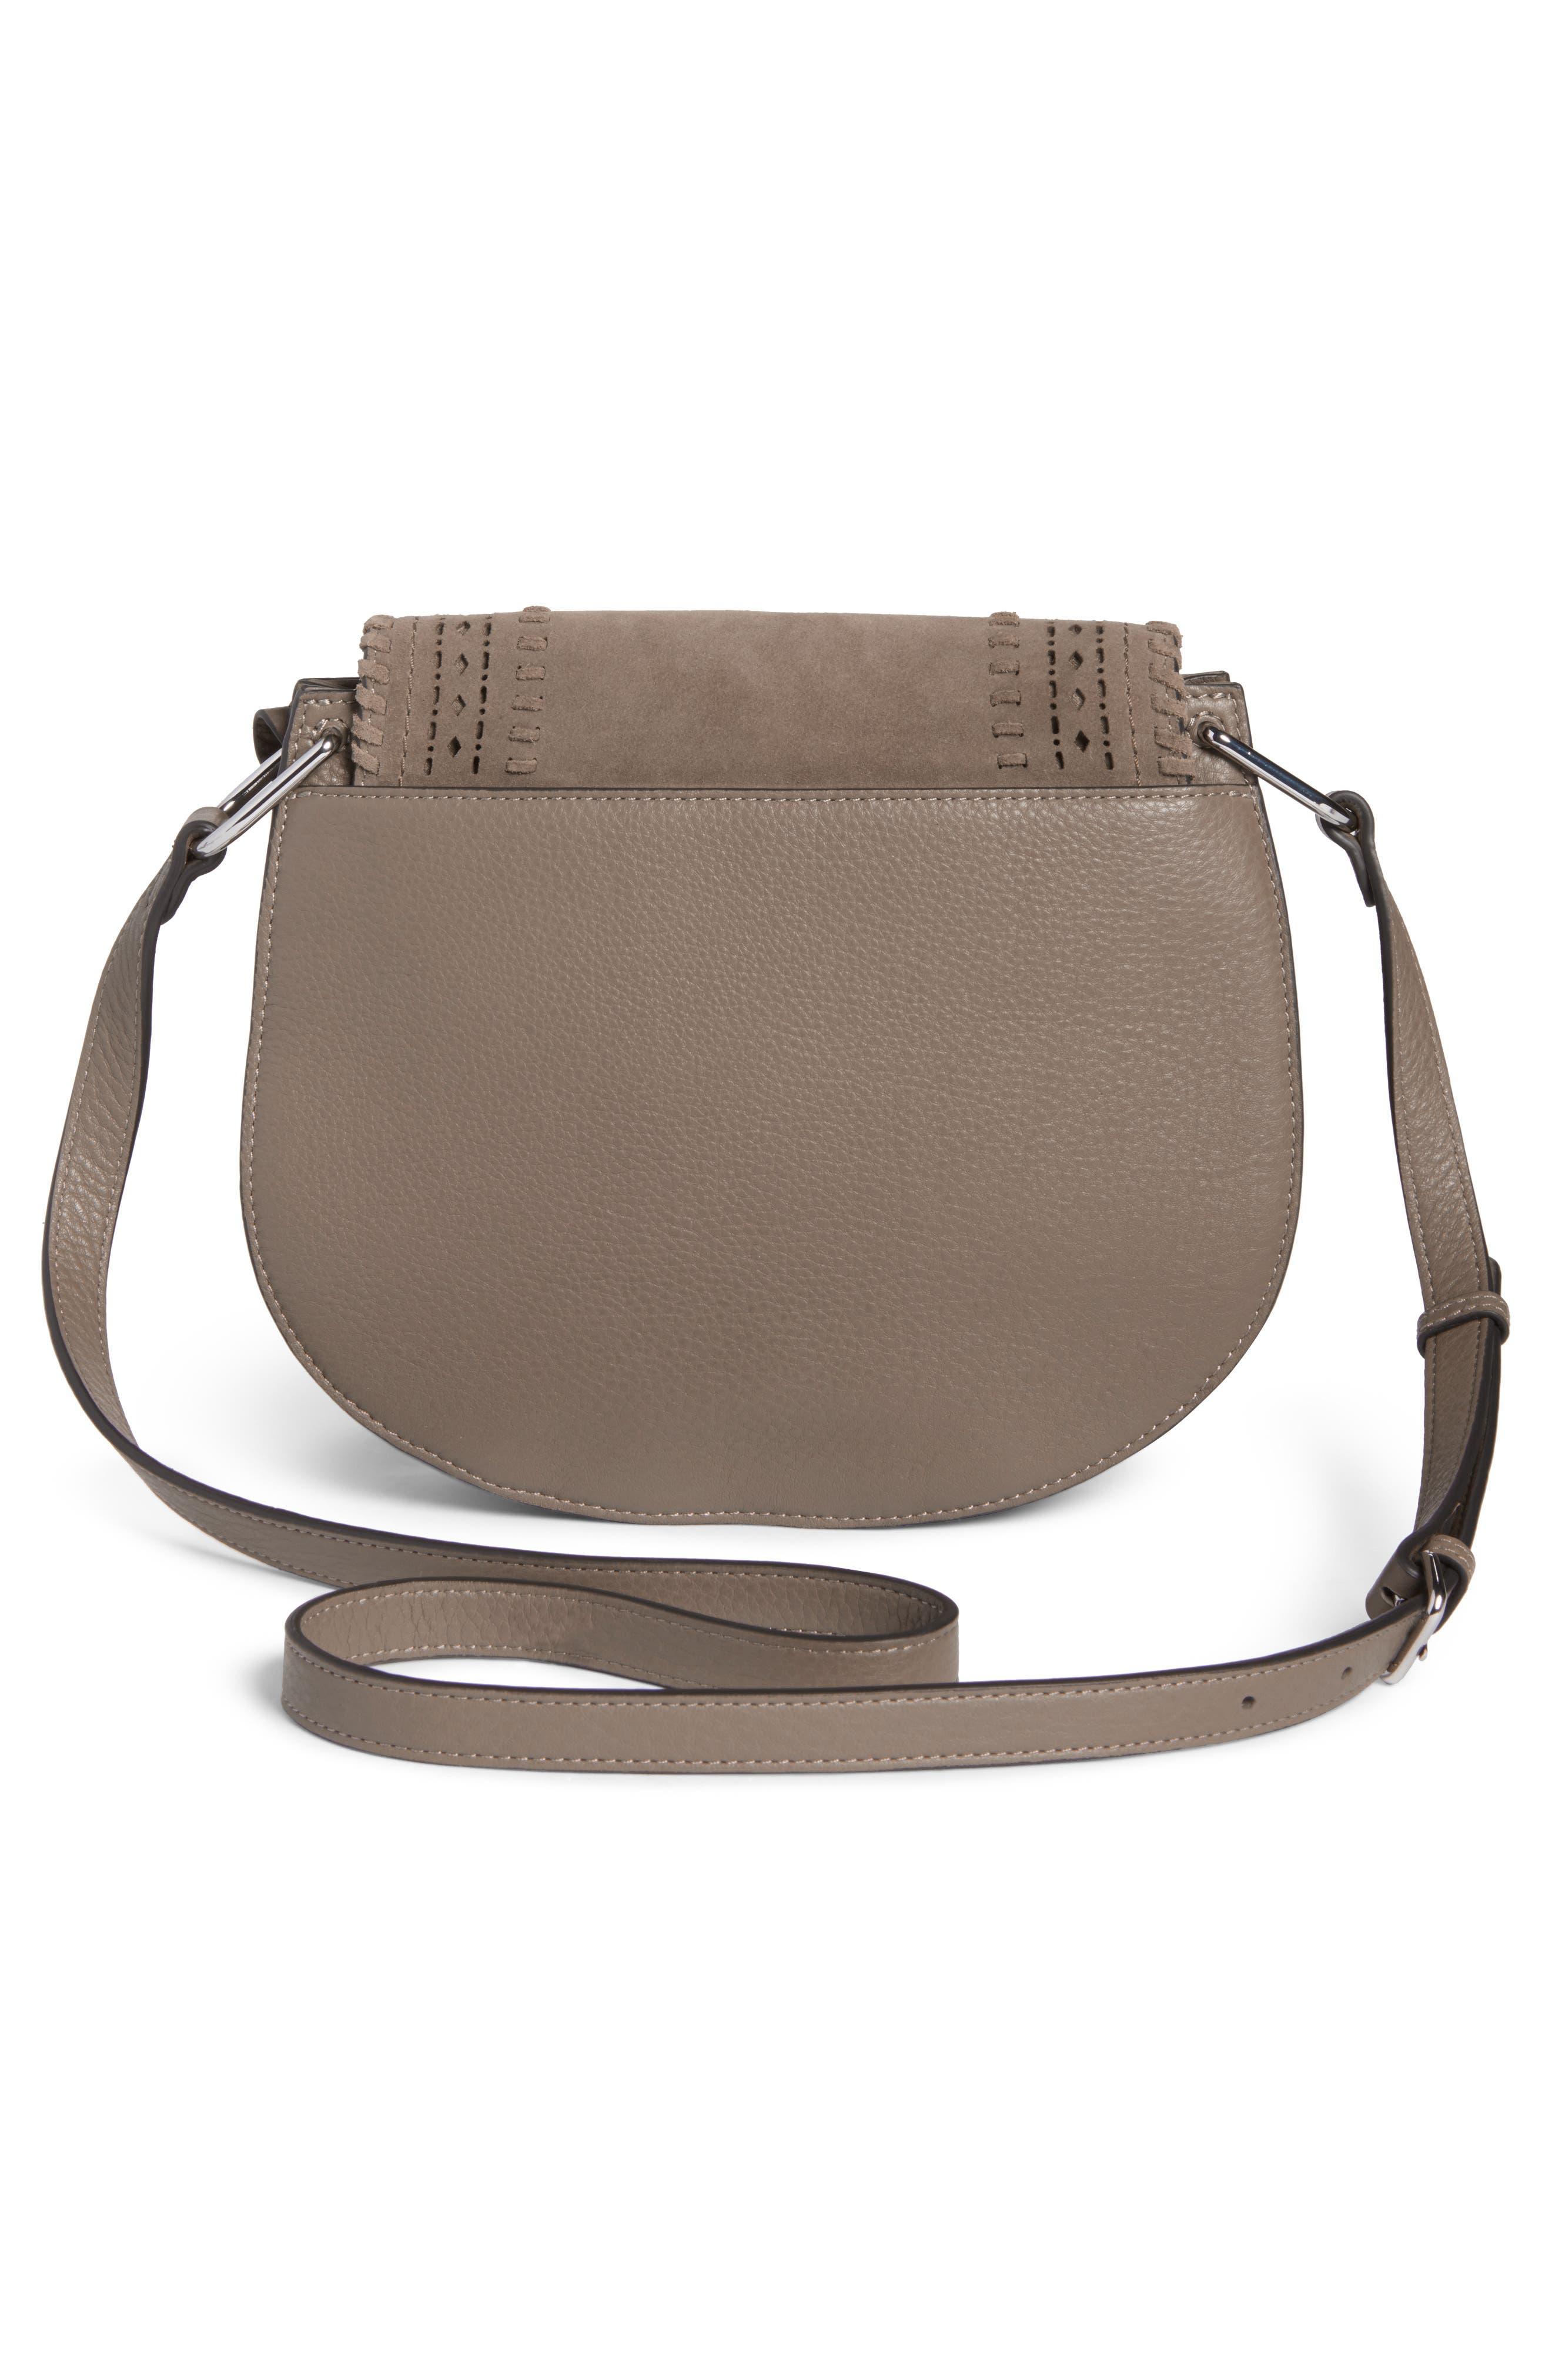 Kirie Suede & Leather Crossbody Saddle Bag,                             Alternate thumbnail 3, color,                             020